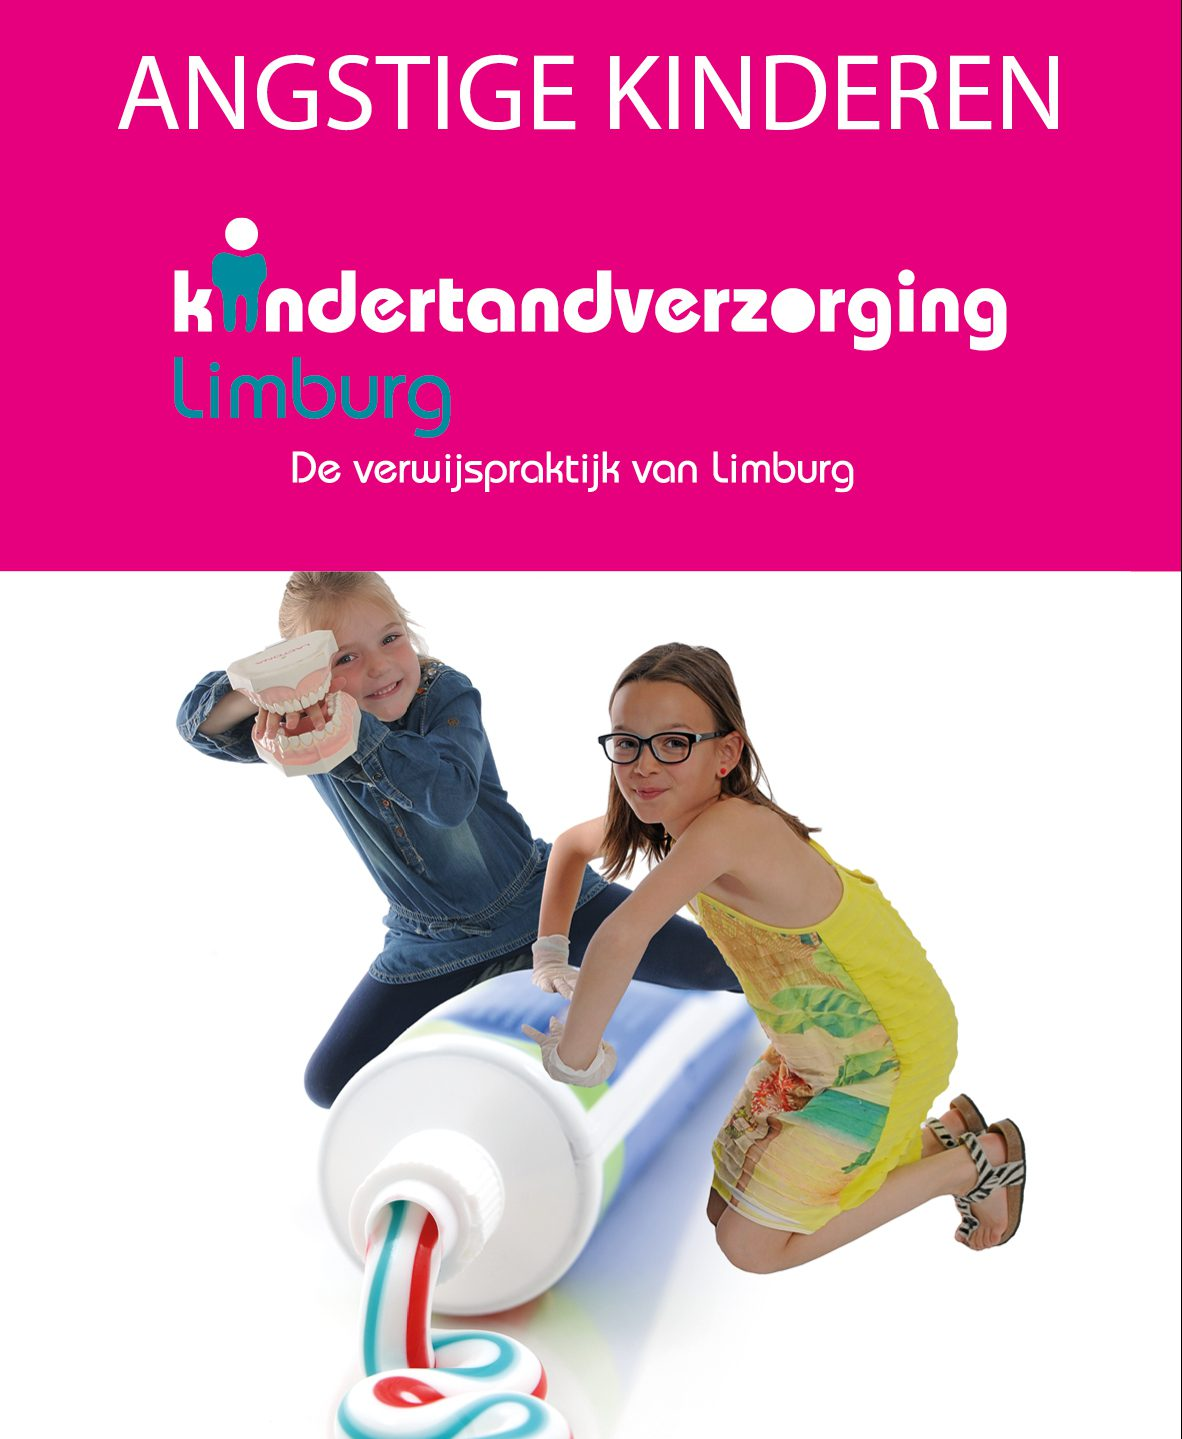 CBT Limburg Kindertandverzorging Limburg